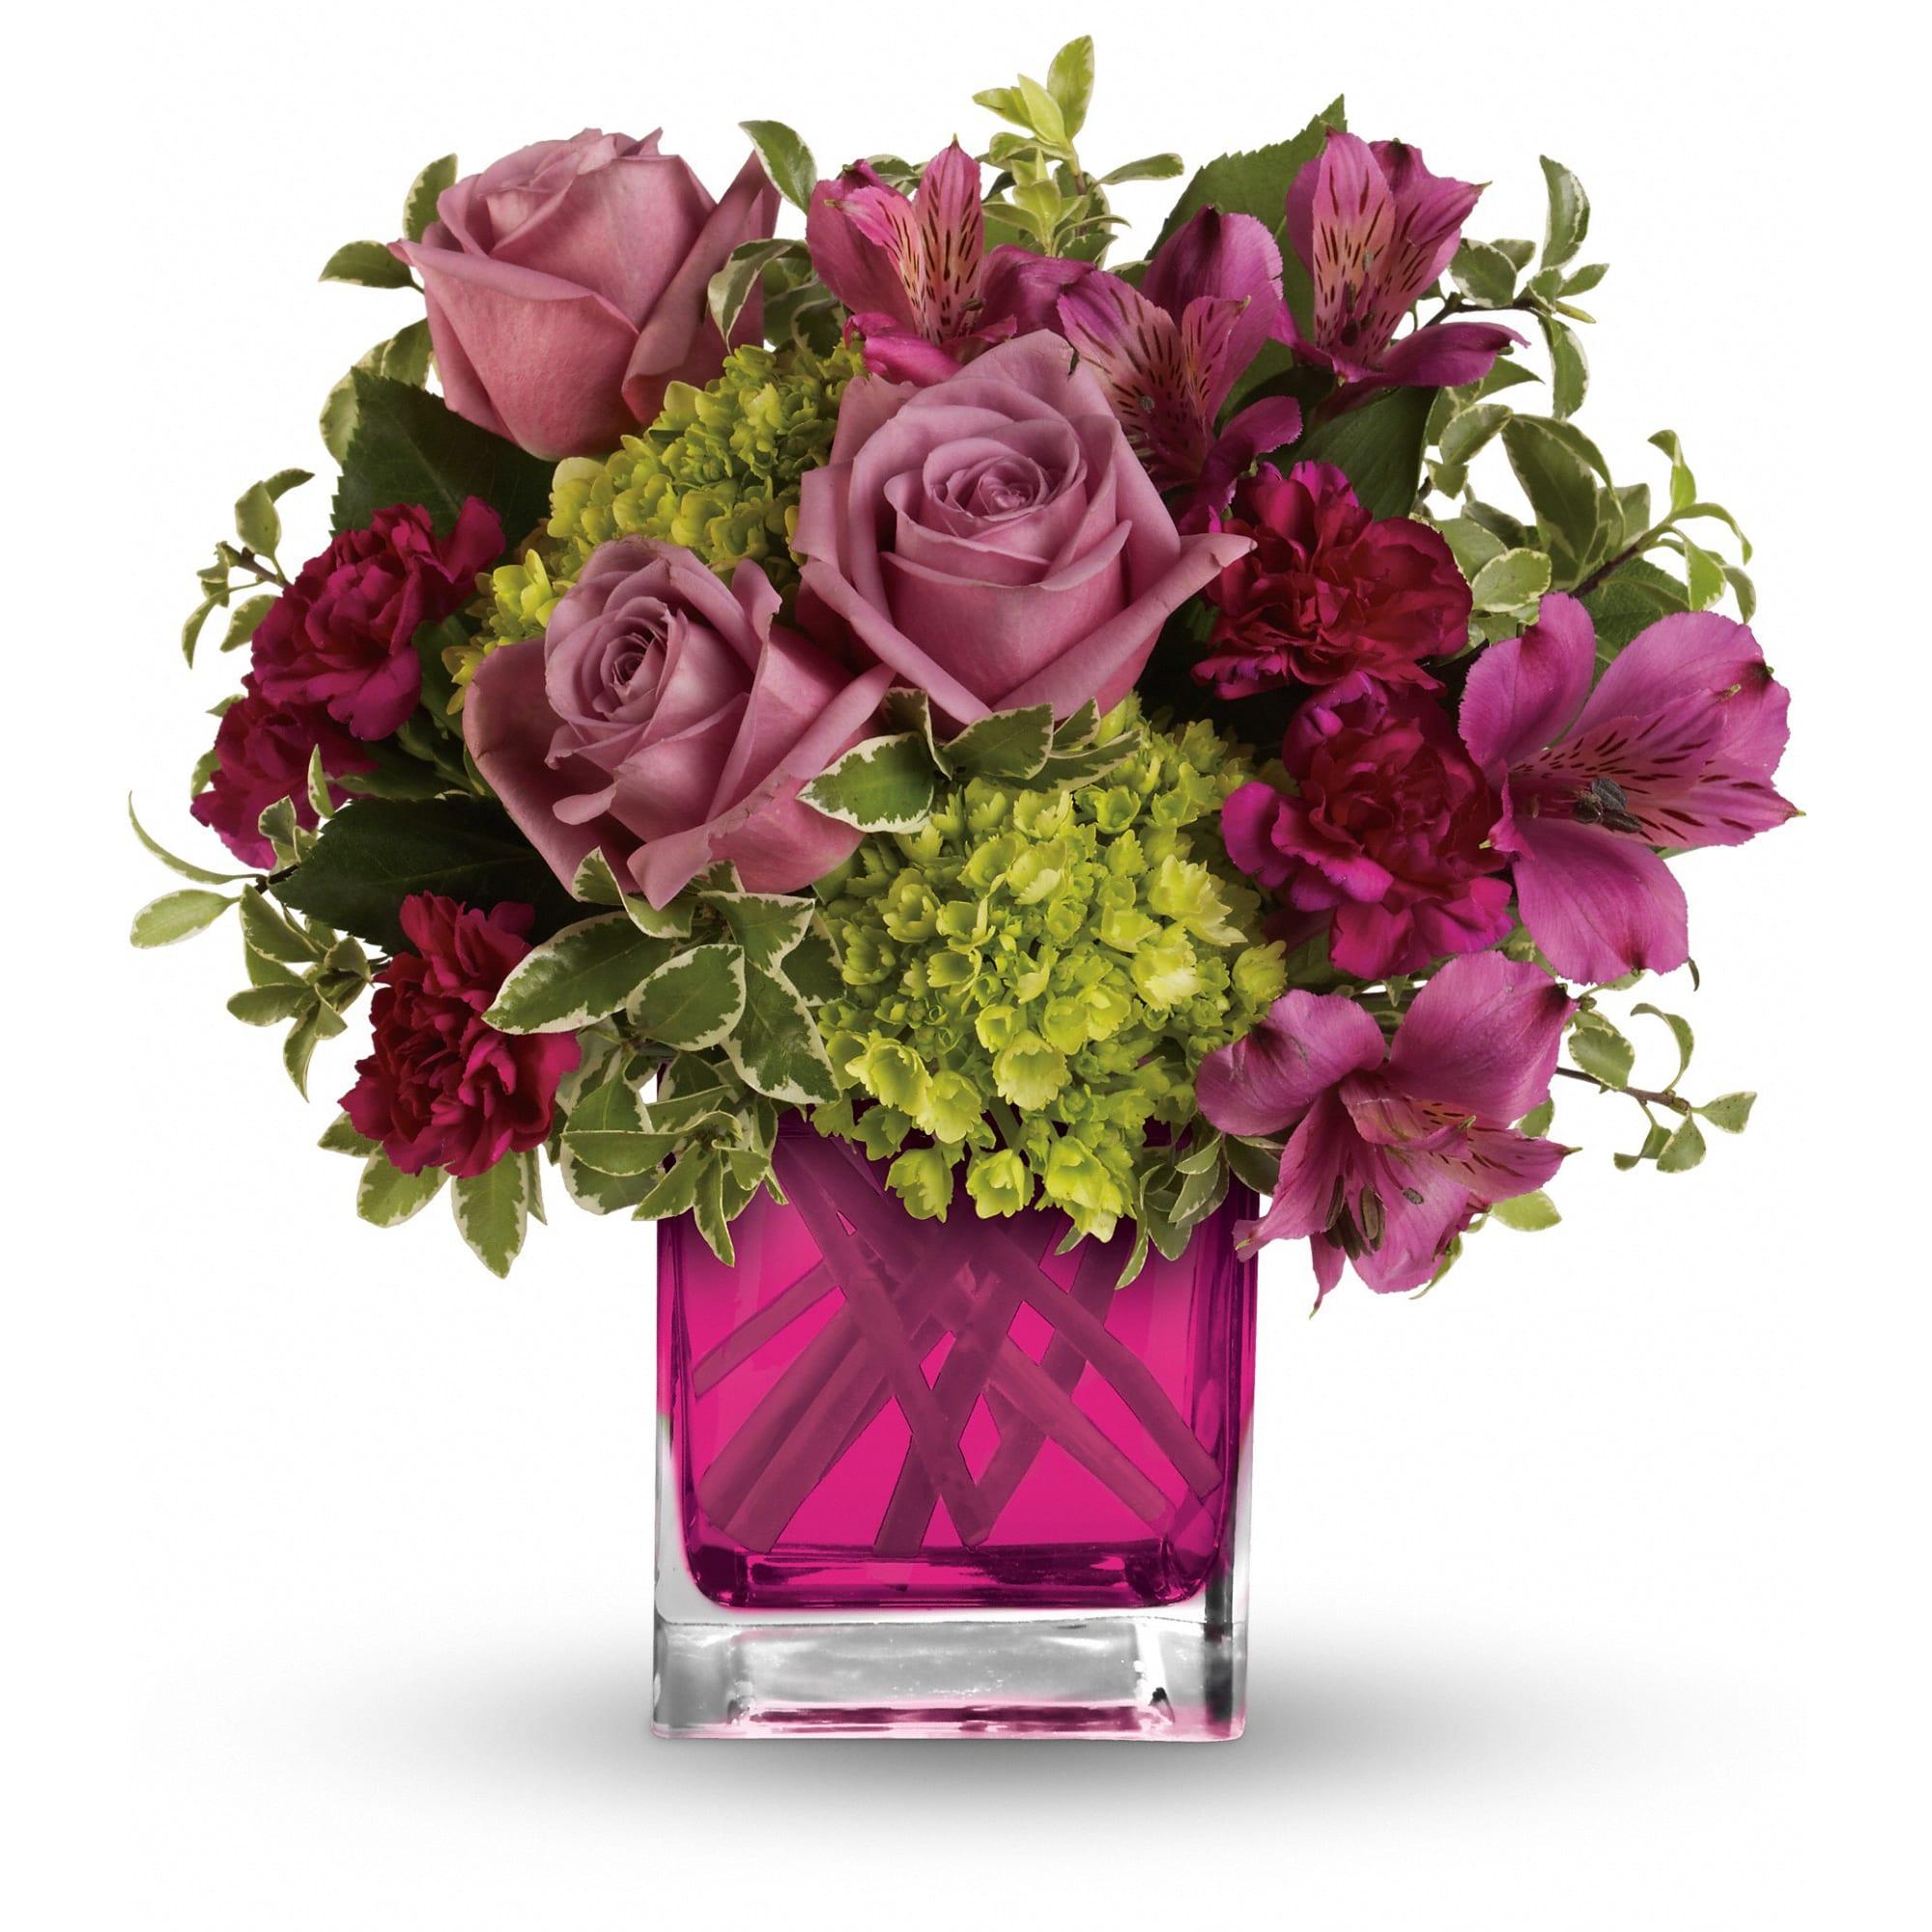 Splendid Surprise by Teleflora in New York City, NY | New York Best Florist